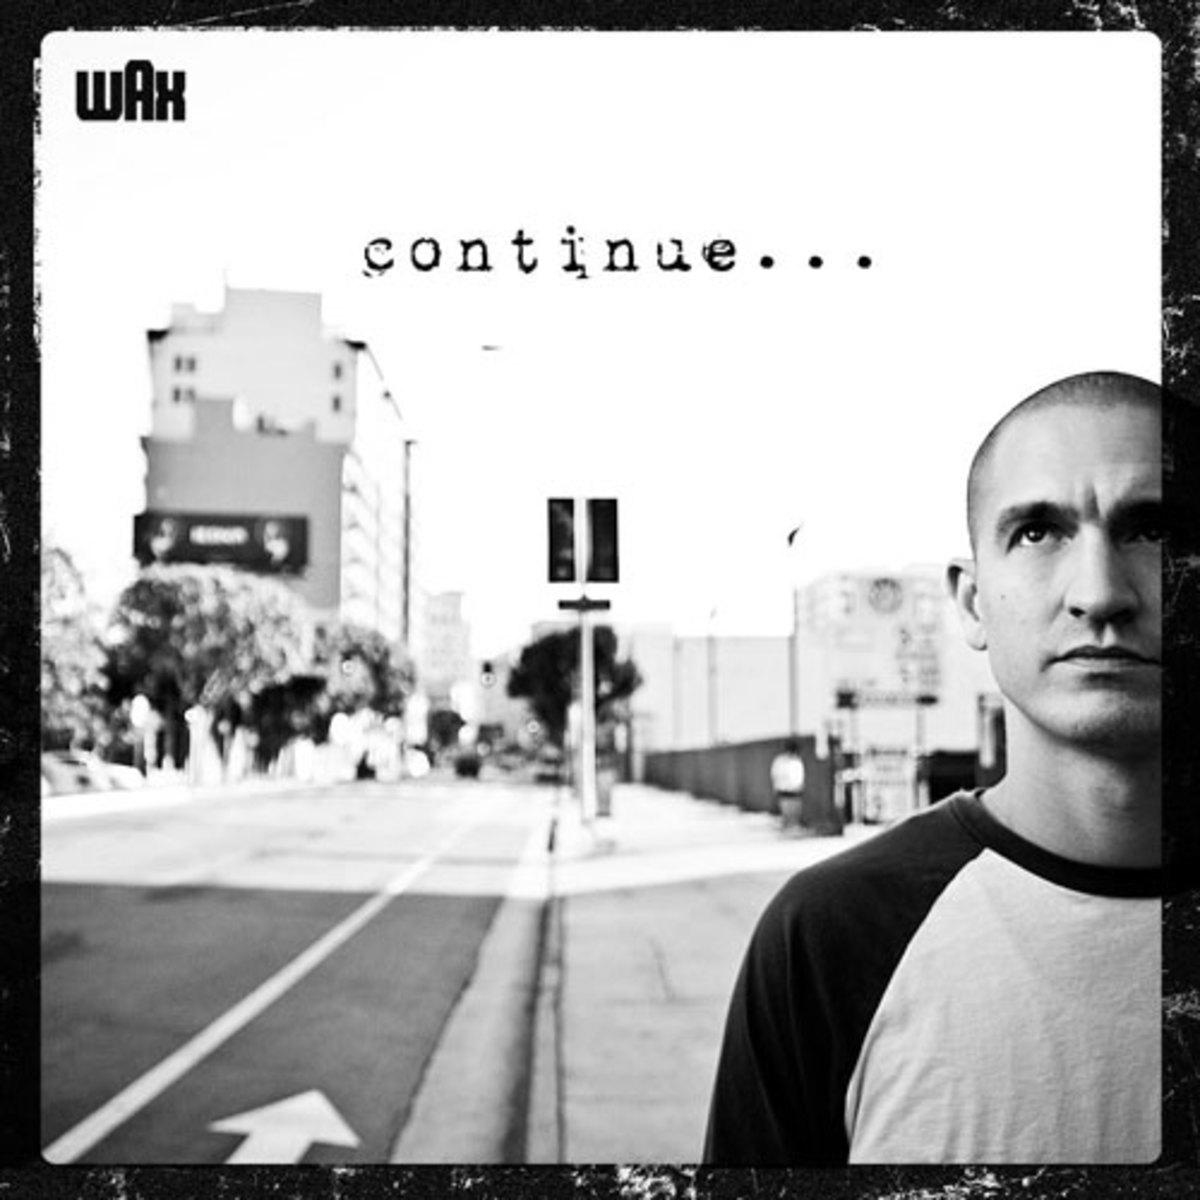 wax-continue.jpg